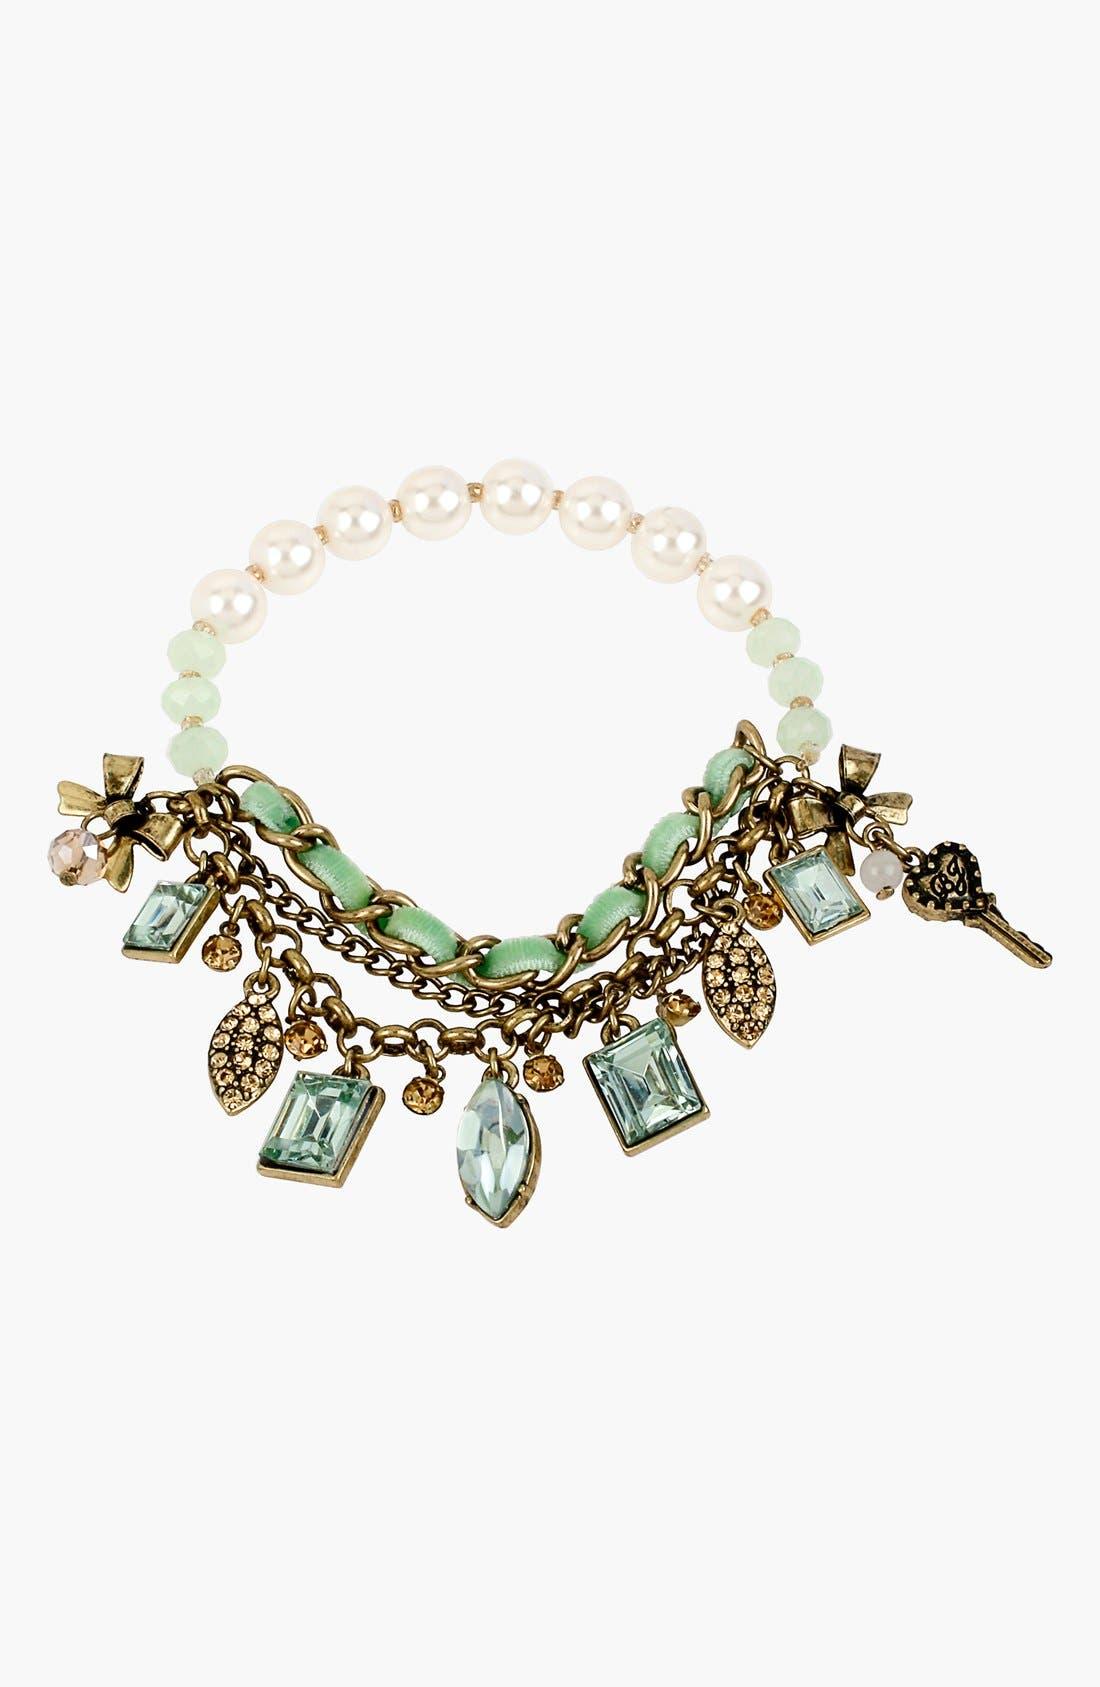 Alternate Image 1 Selected - Betsey Johnson 'Mint Multi' Faux Pearl Charm Bracelet